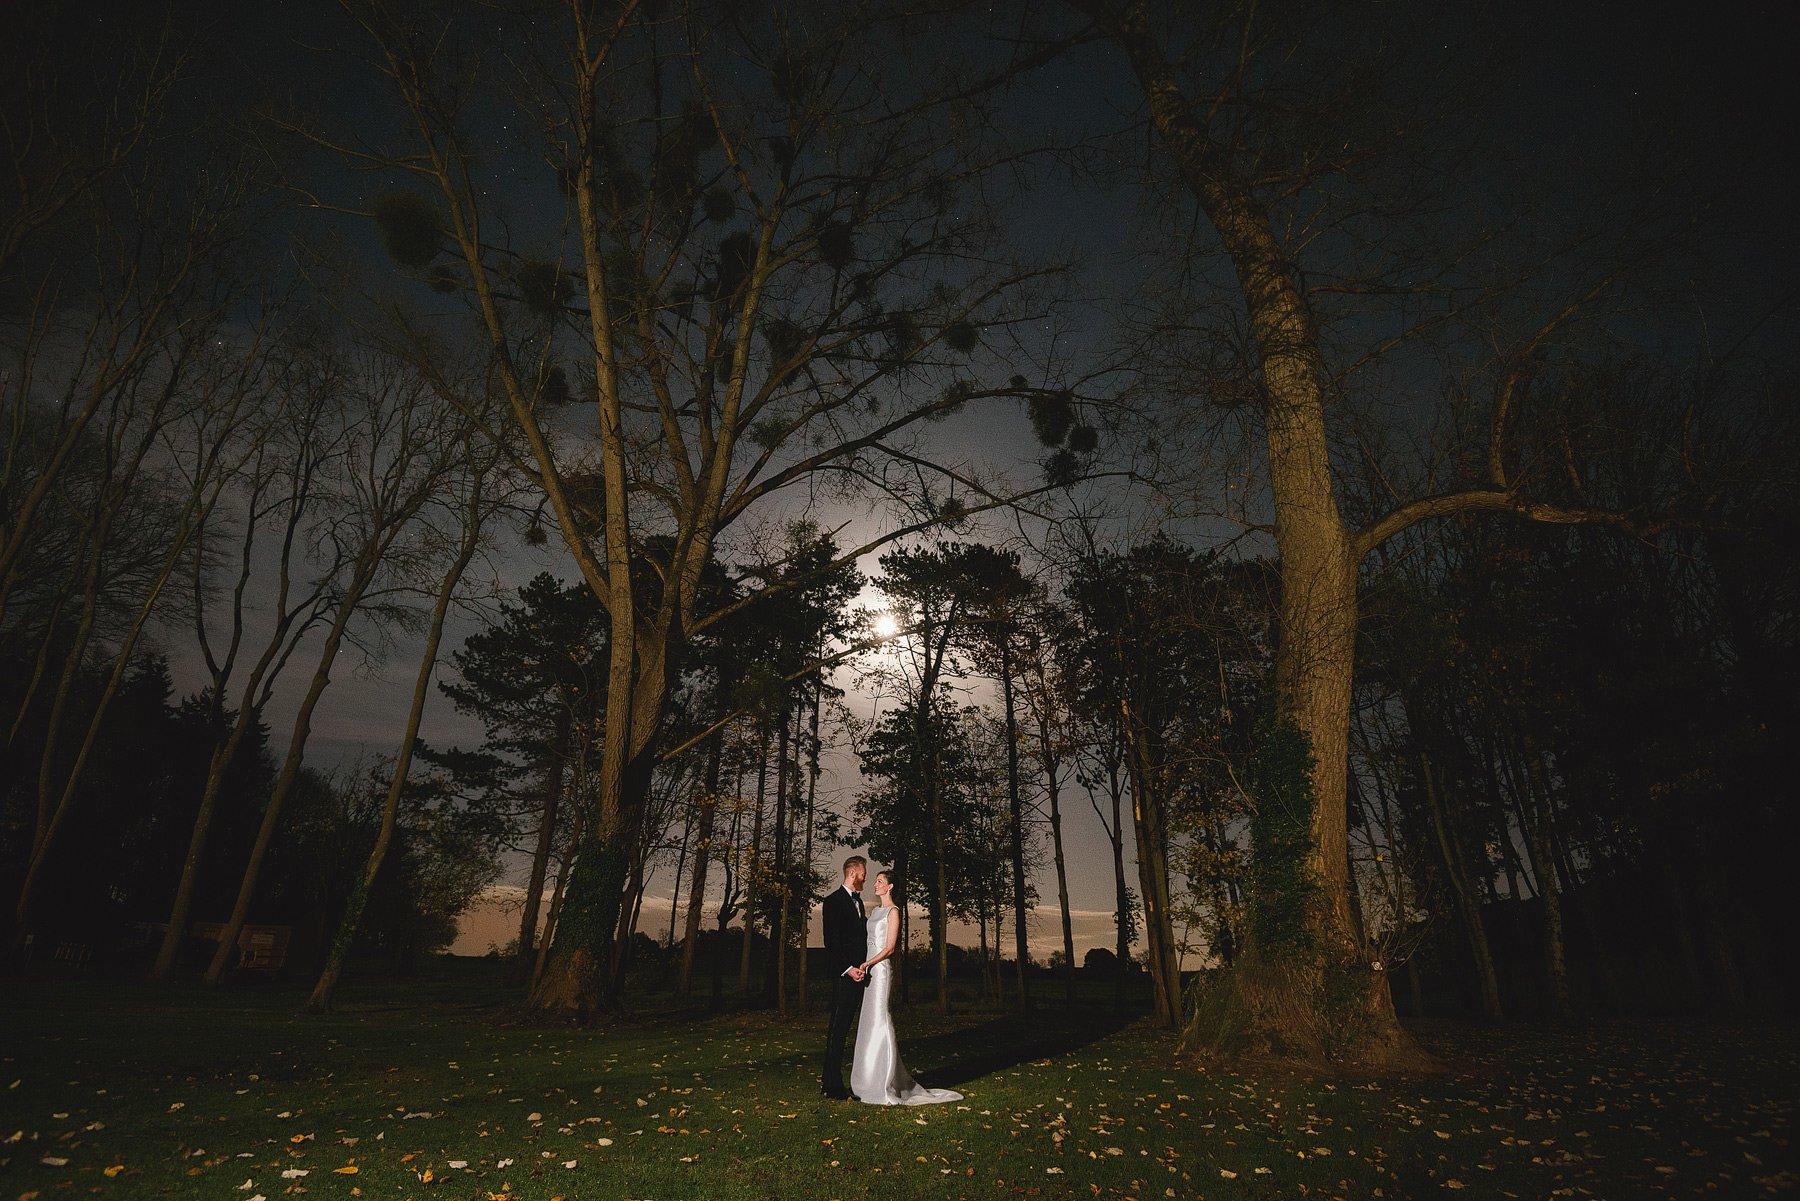 weddings at brinsop court